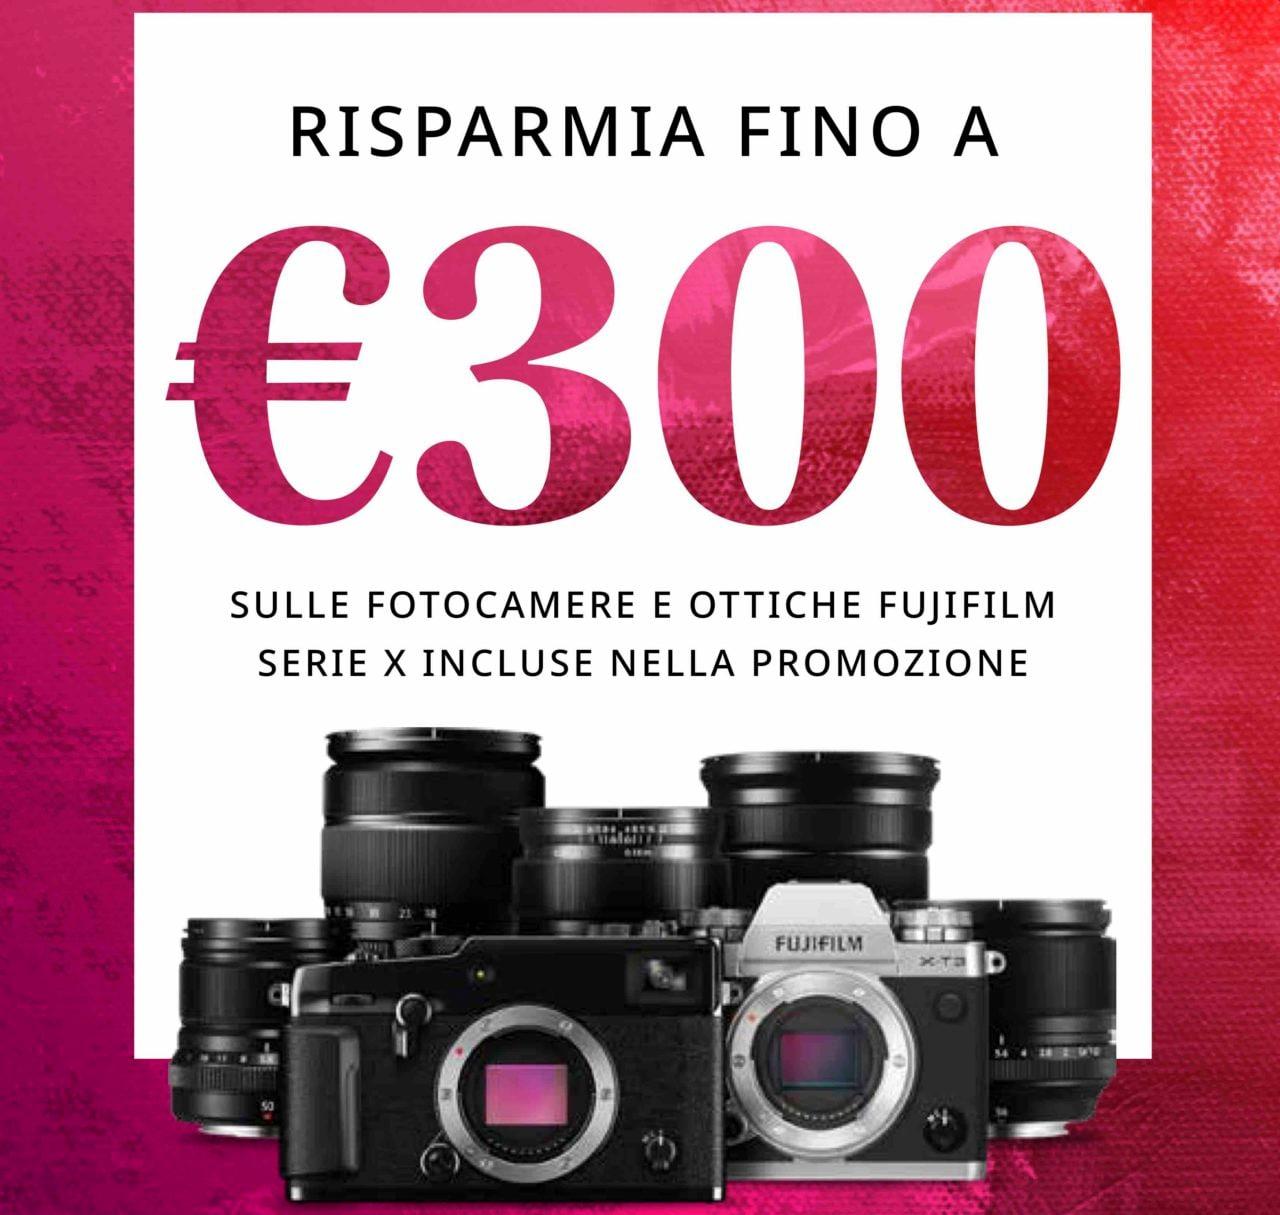 Fujifilm sconta e rimborsa fino a 300€: Cashback e Instant Rebate per mirrorless e ottiche